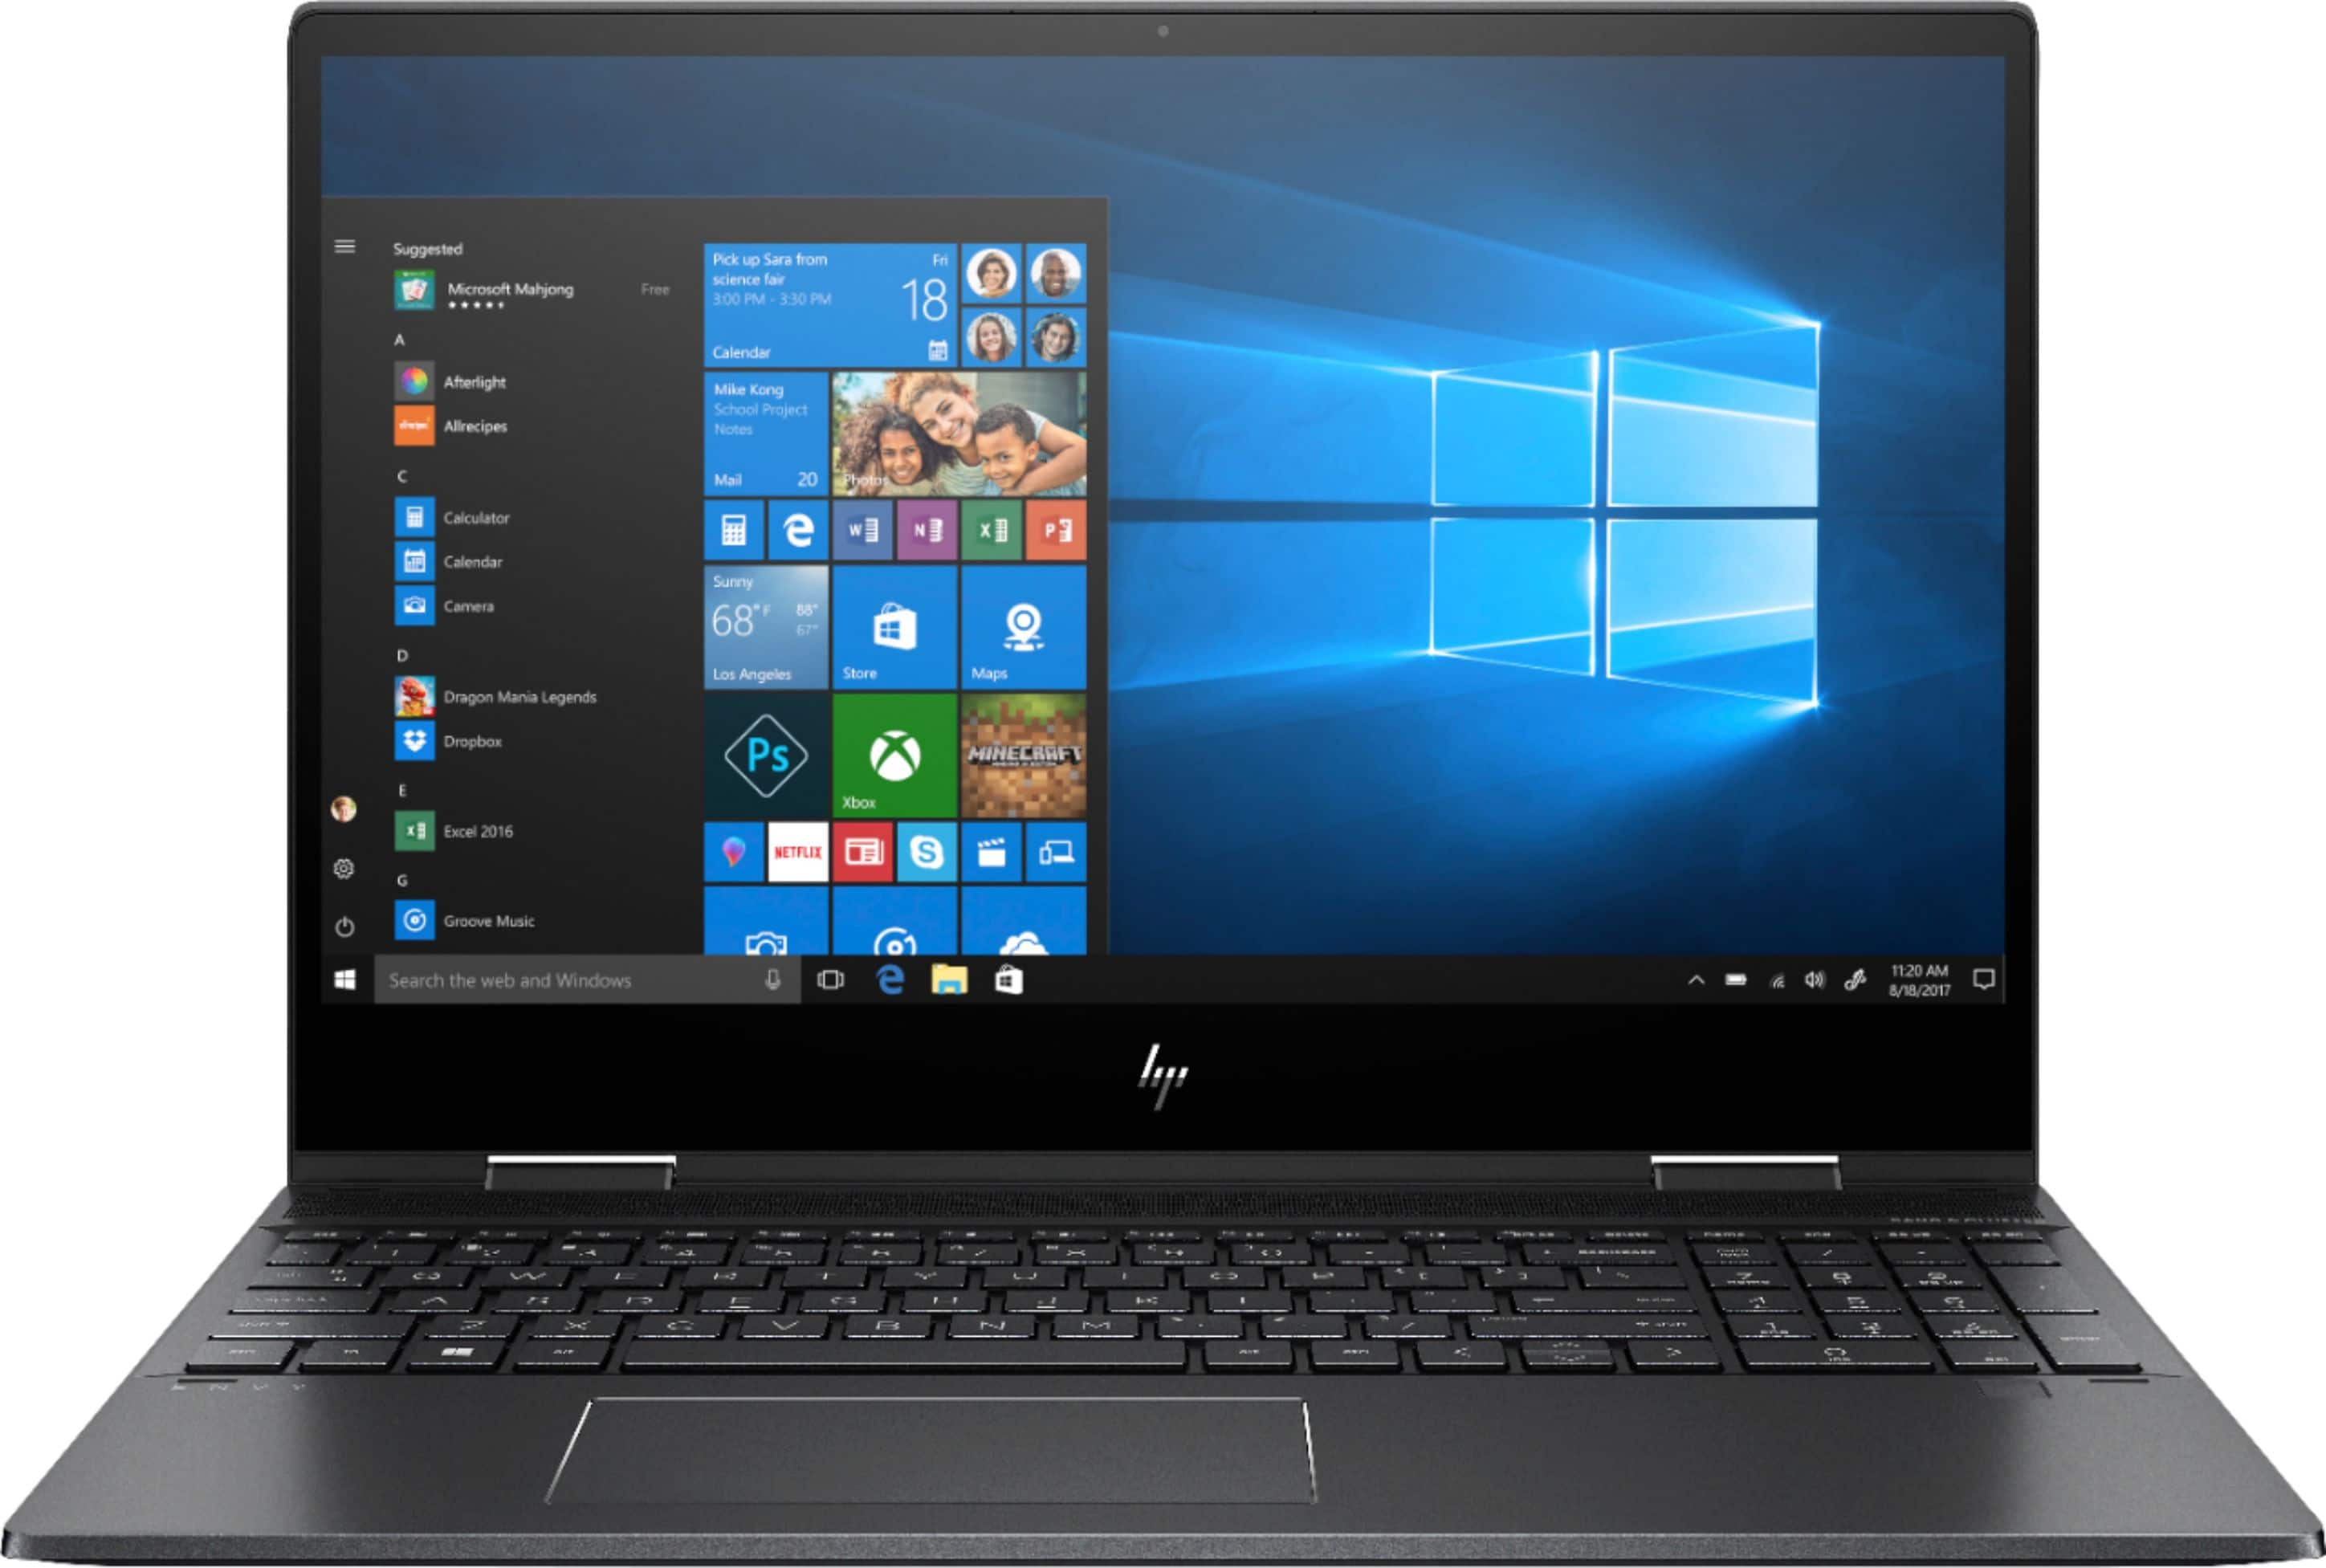 "HP - ENVY x360 2-in-1 15.6"" Touch-Screen Laptop - AMD Ryzen 7 - 8GB Memory - AMD Radeon RX Vega 10 - 256GB SSD - Sandblasted Anodized Finish, Nightfall Black $650"